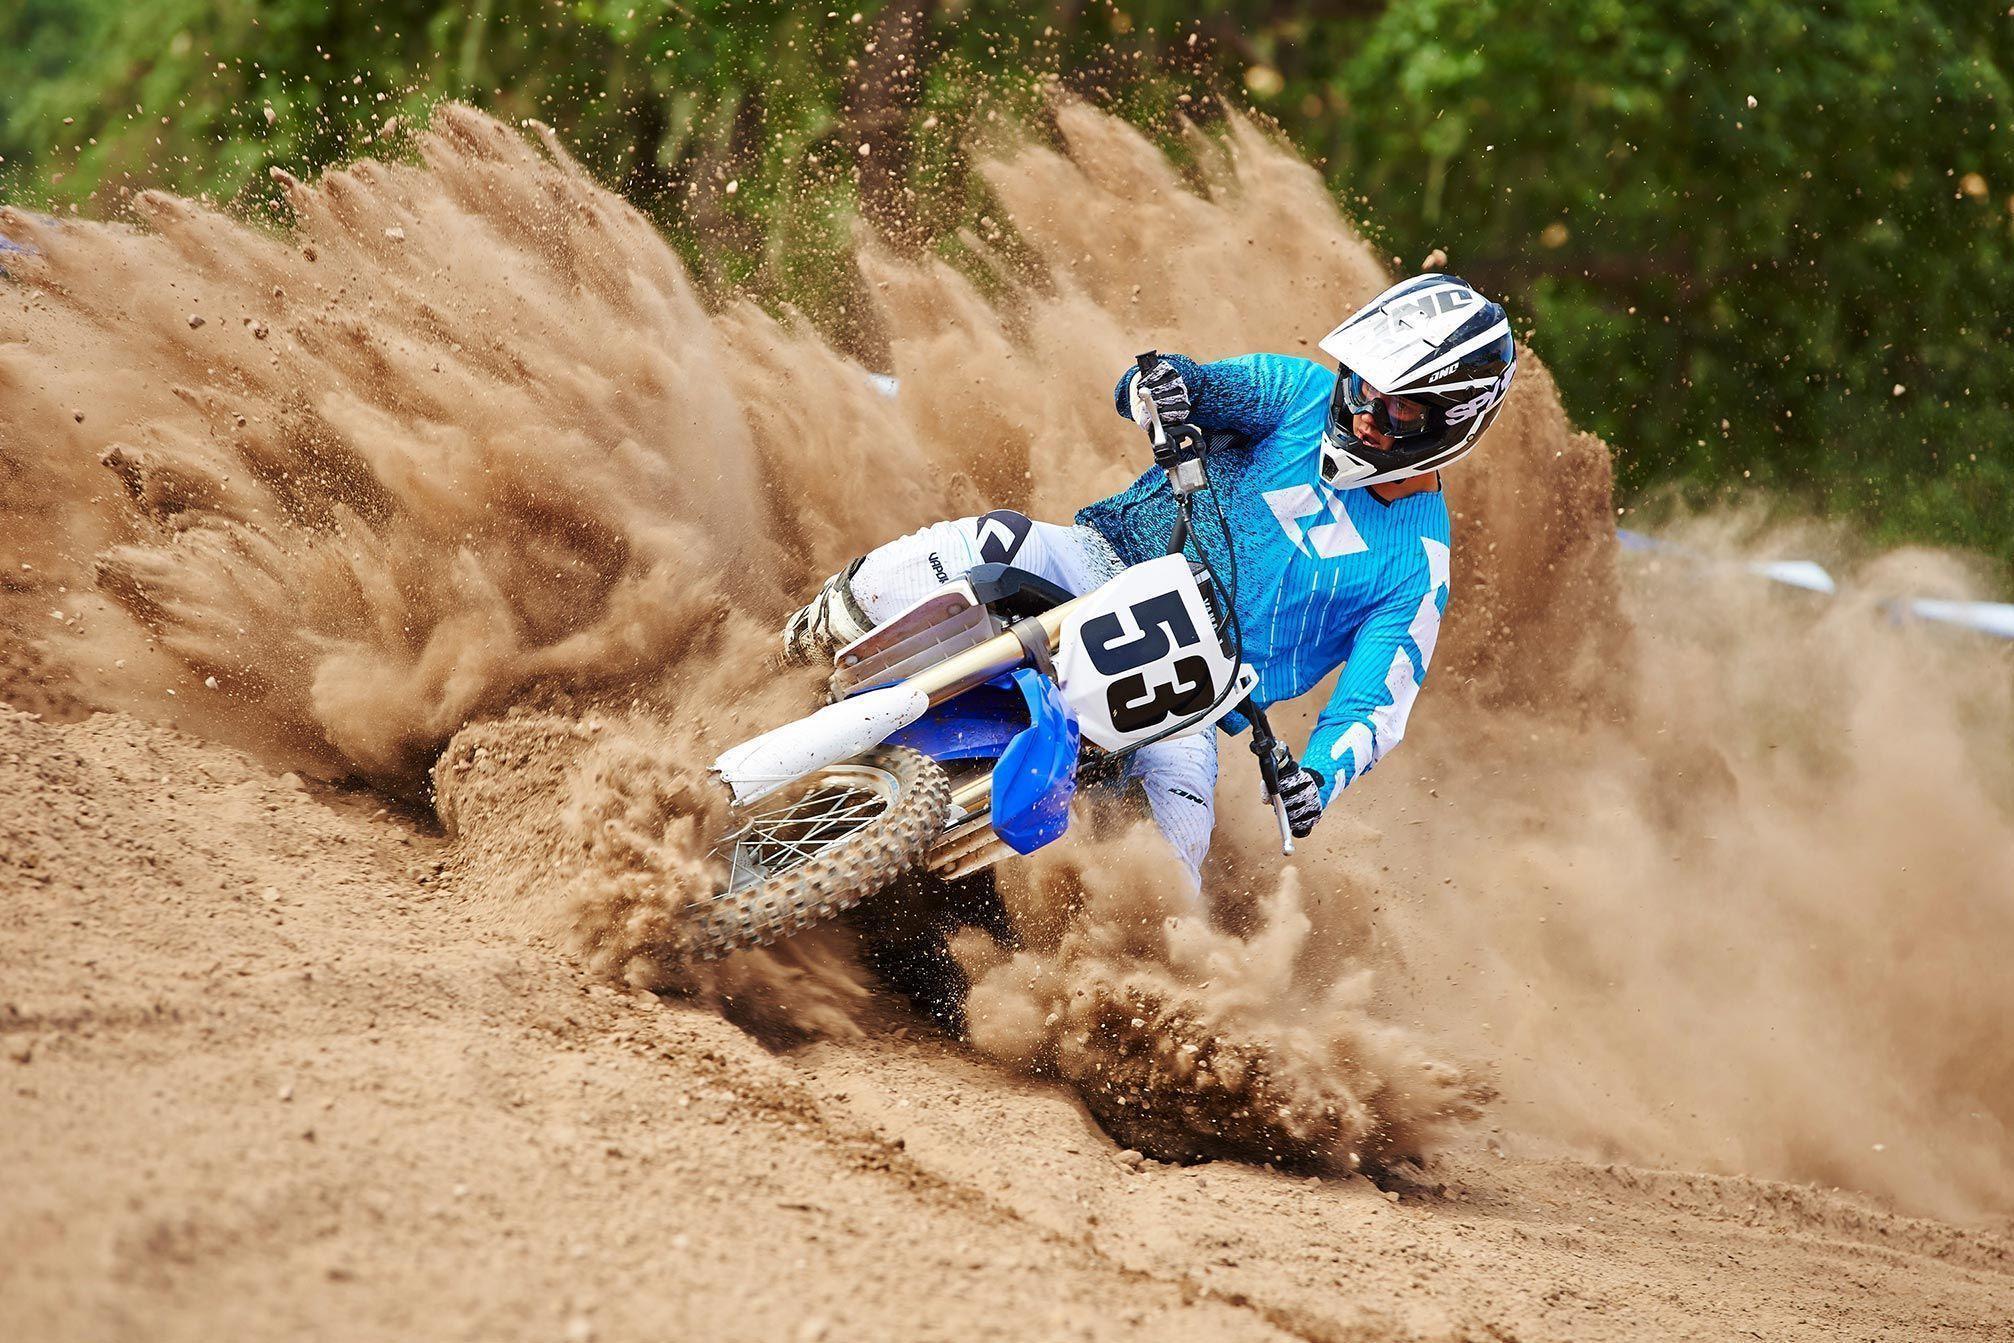 Yamaha Yz450f Dirt Motorcycle Wallpaper Hd Desktop: Dirt Bikes Wallpapers